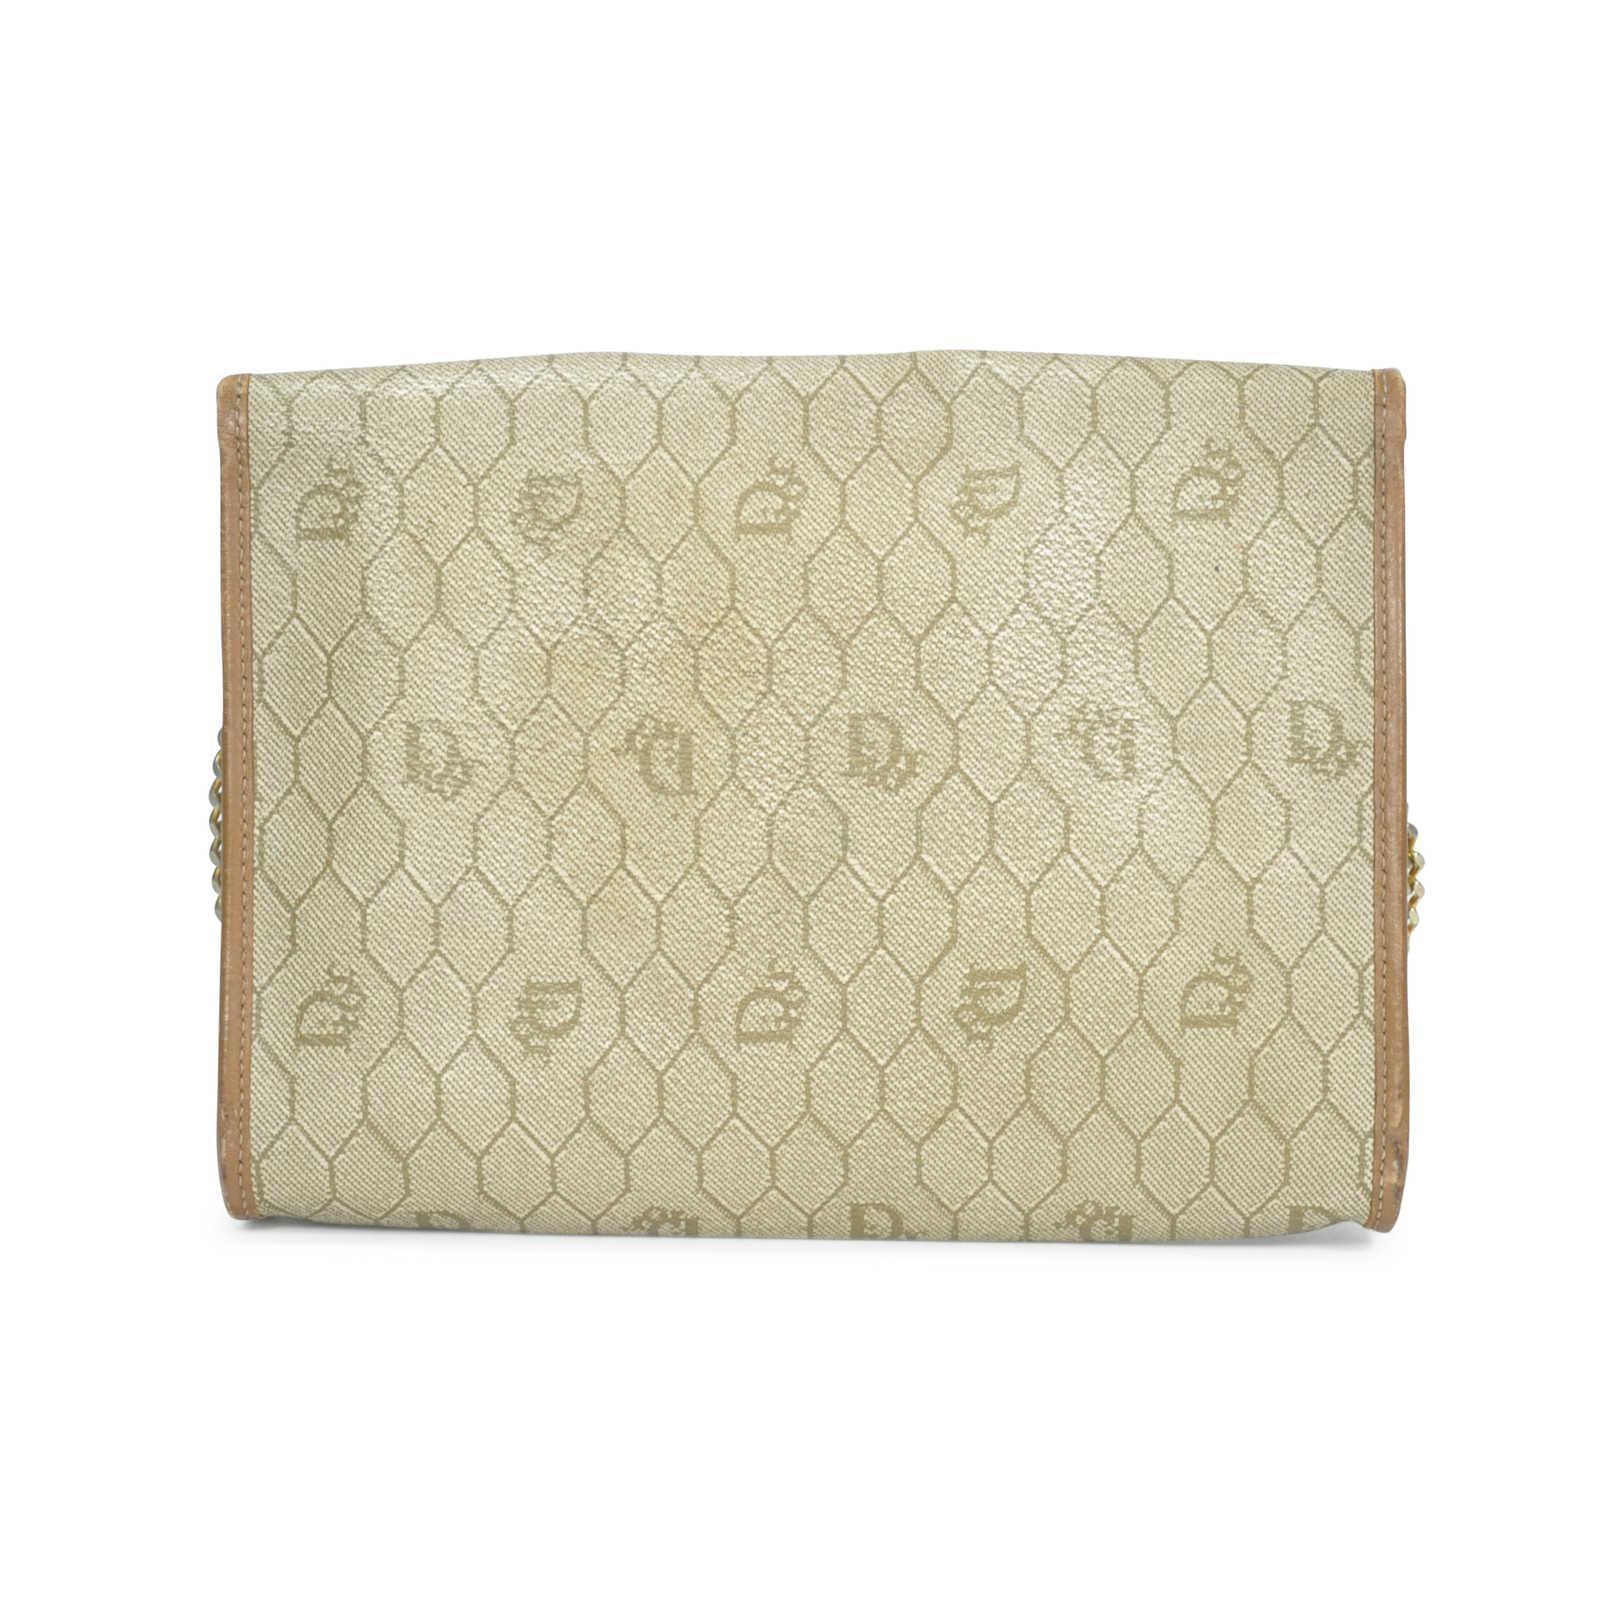 aef81958e14d ... Authentic Vintage Dior Honeycomb Chain Strap Bag (PSS-201-00006) -  Thumbnail ...